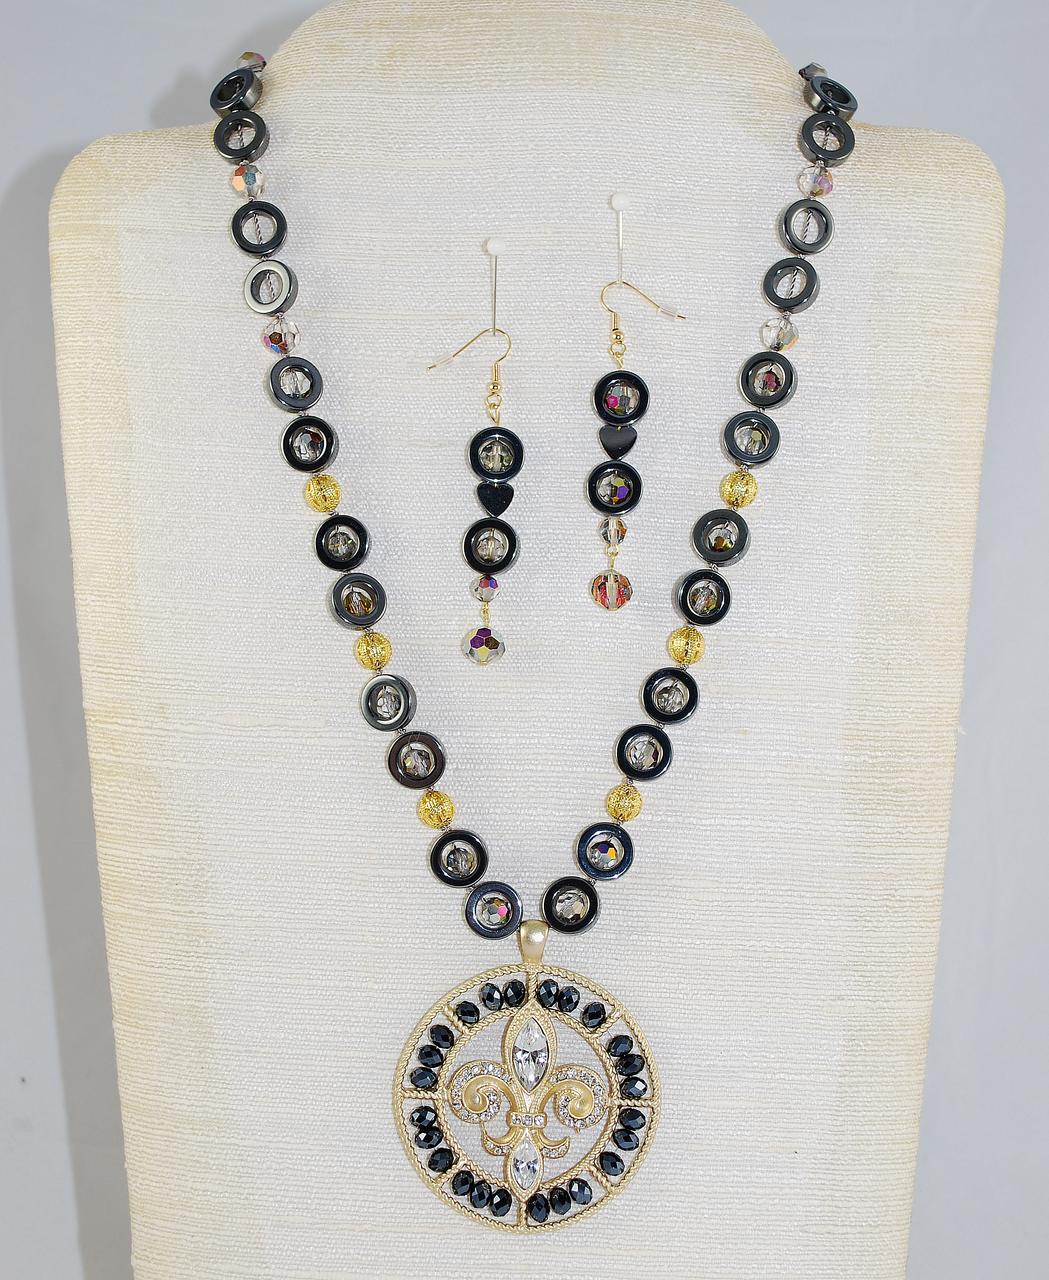 Enchanting Jewelry Creations image 9